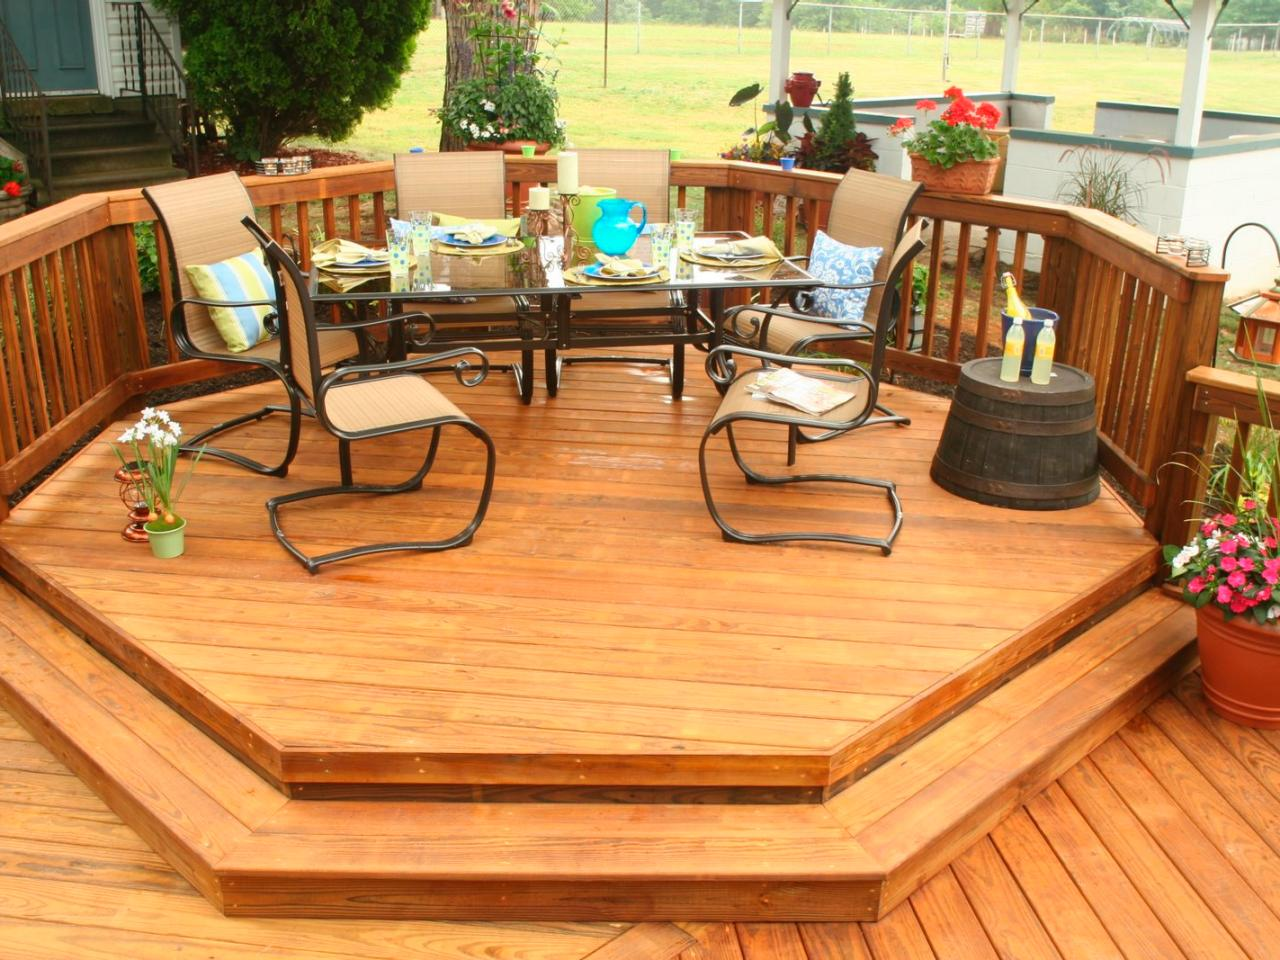 Pressure treated cedar deck